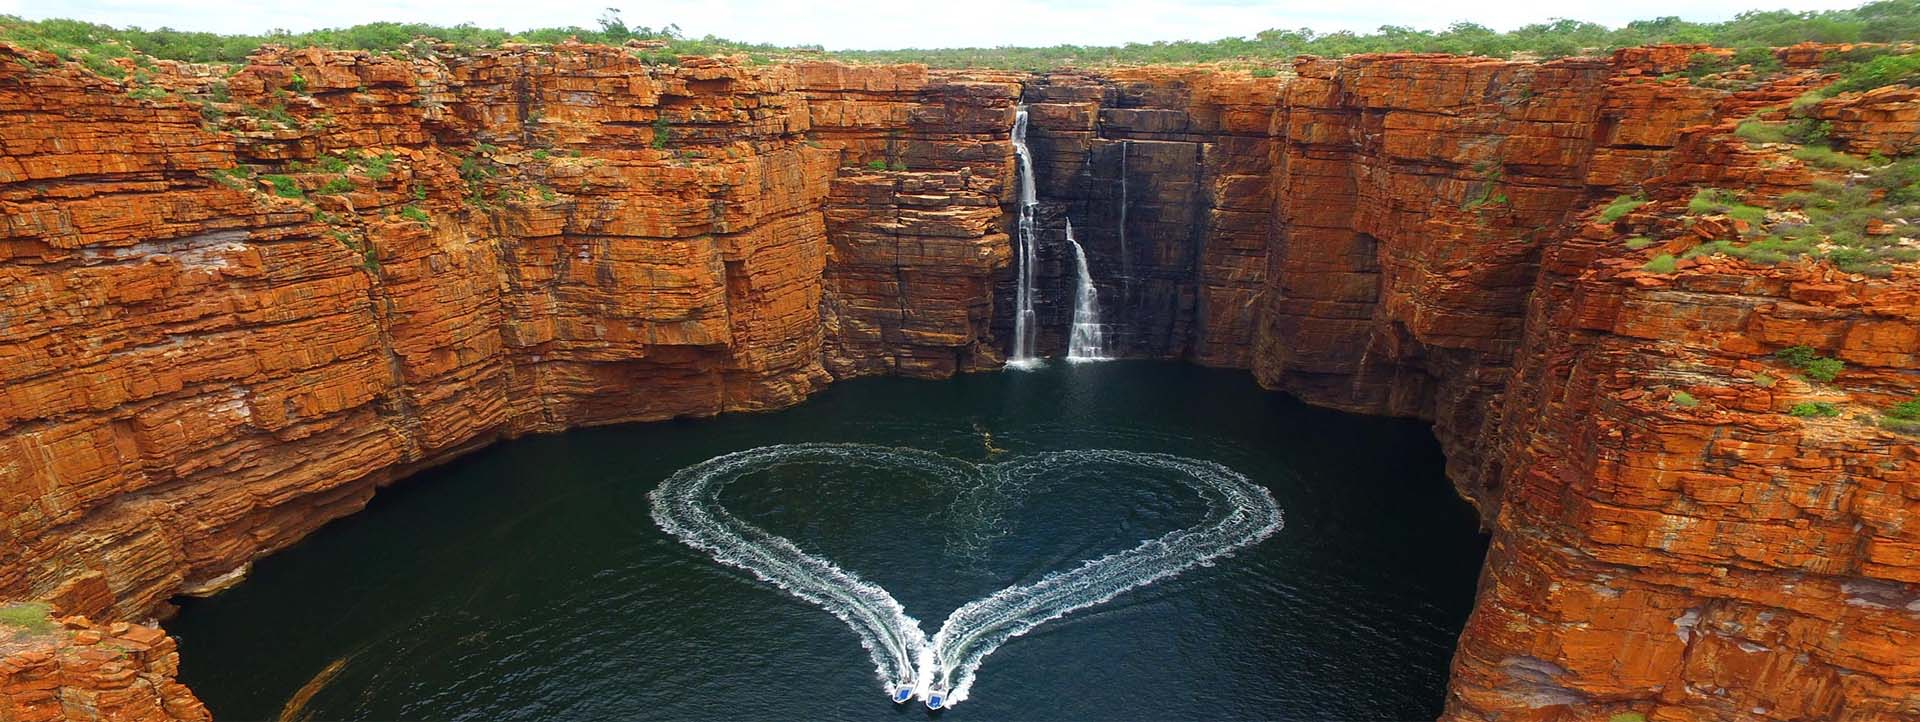 GREAT ESCAPE Cabin slider King George Falls heart